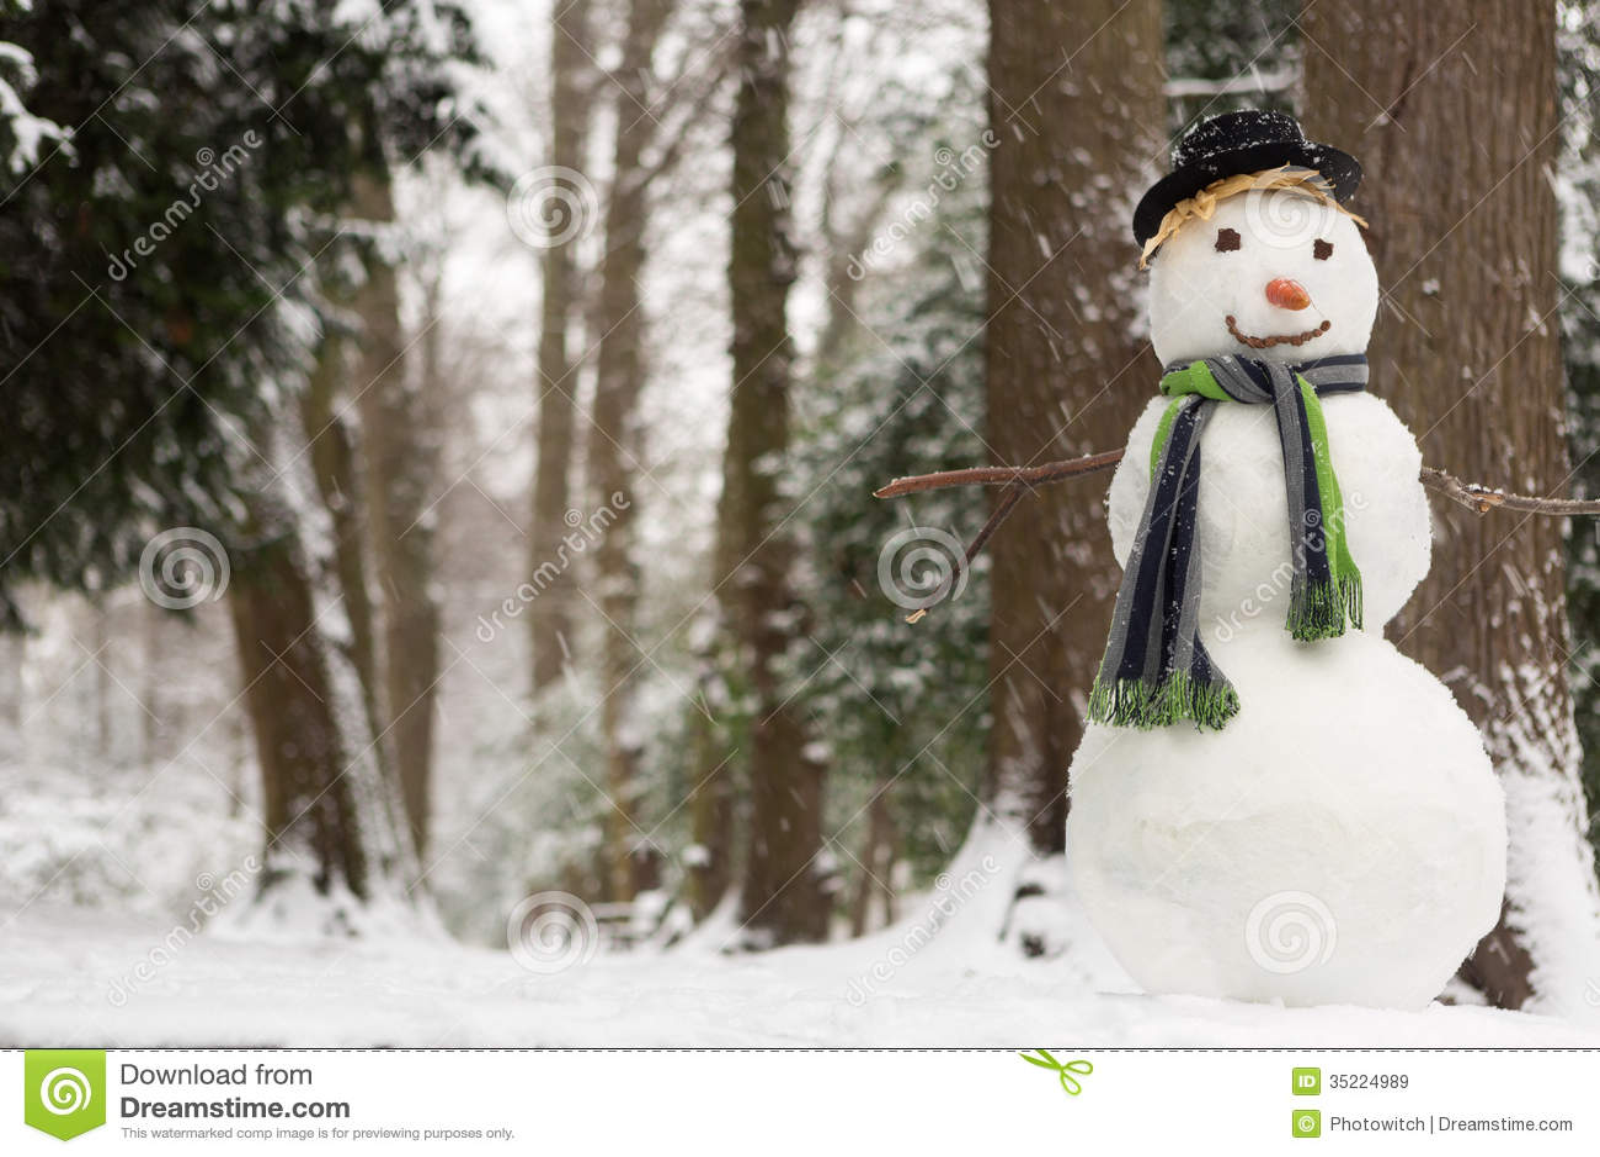 Snowy Day Snowman Winter